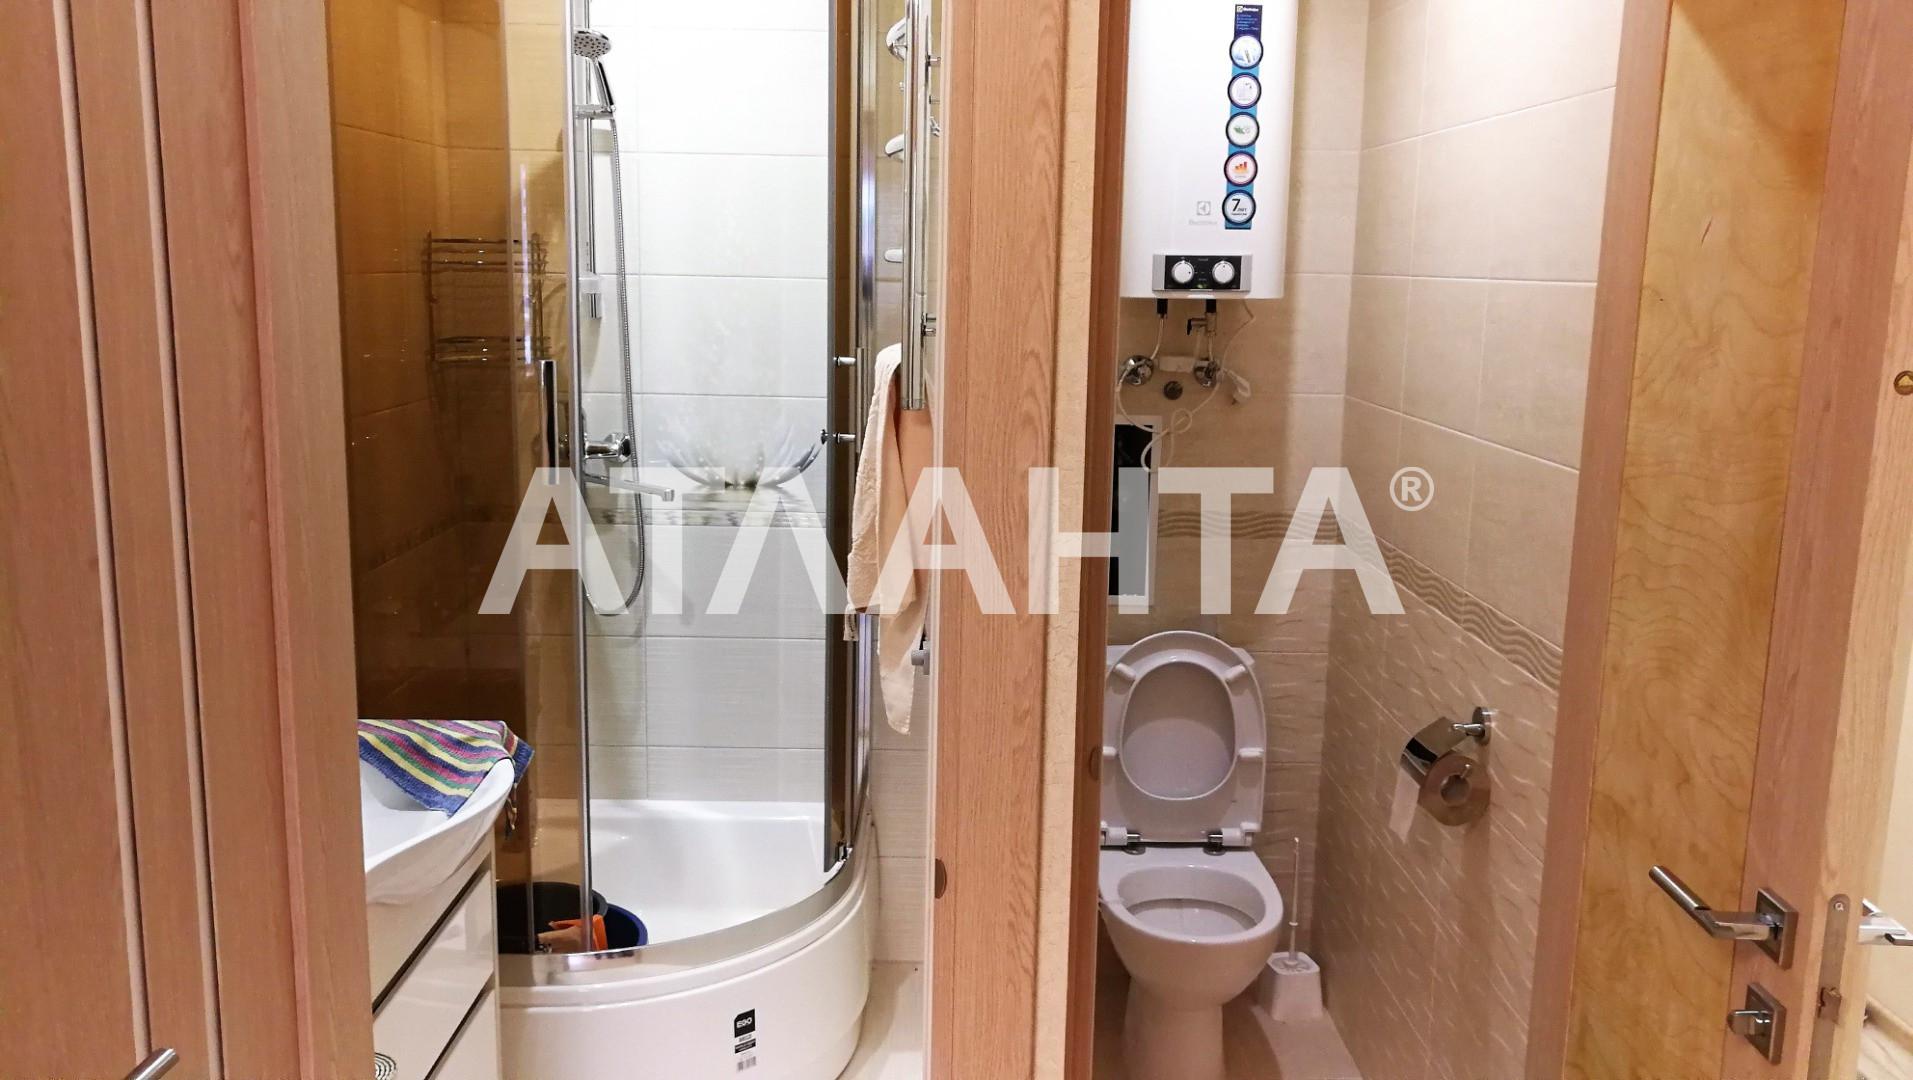 Продается 2-комнатная Квартира на ул. Пер. Ярослава Хомова — 51 000 у.е. (фото №5)